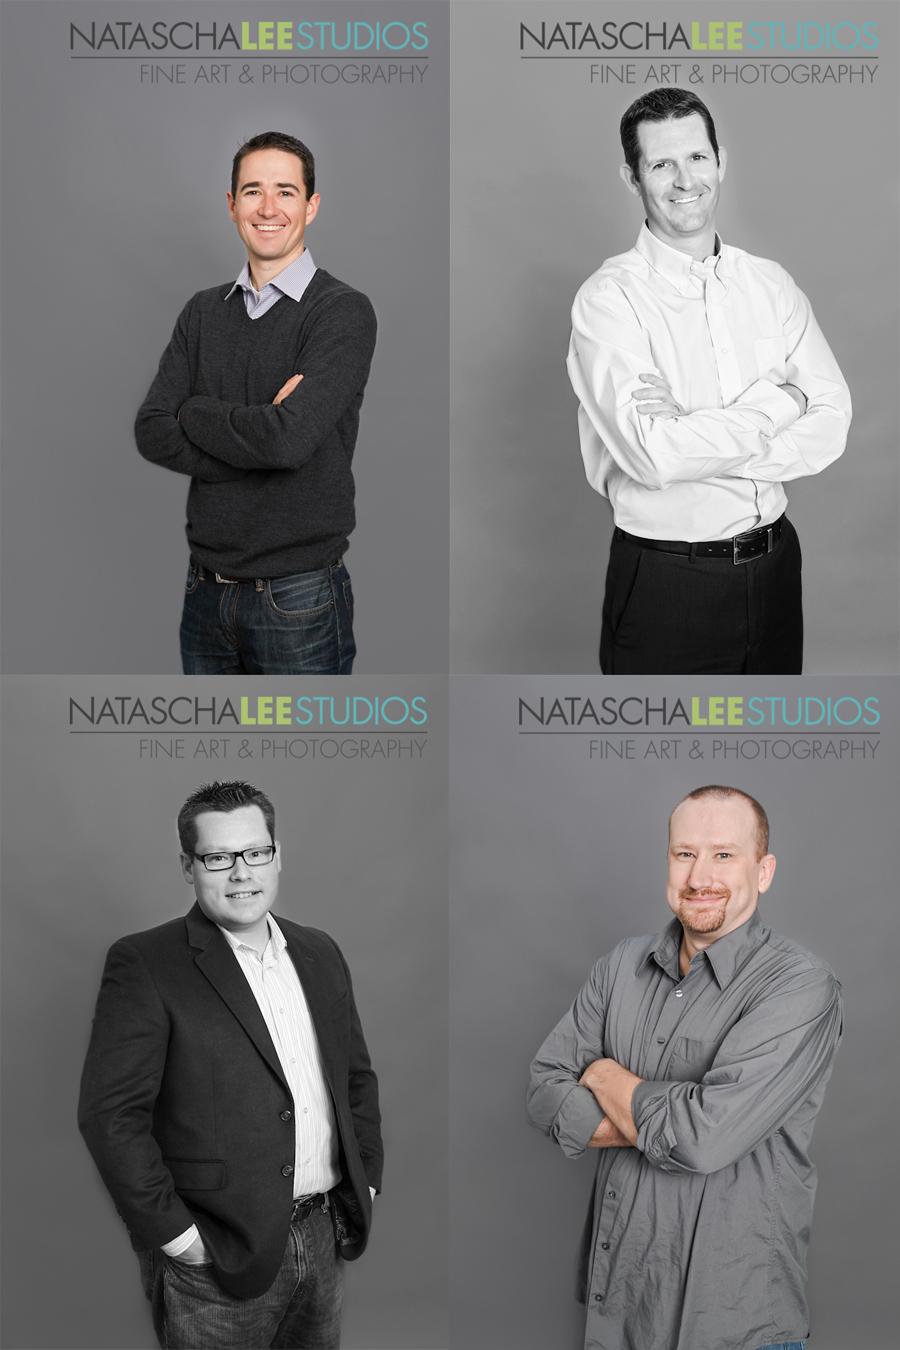 Corporate Headshots by Natascha Lee Studios